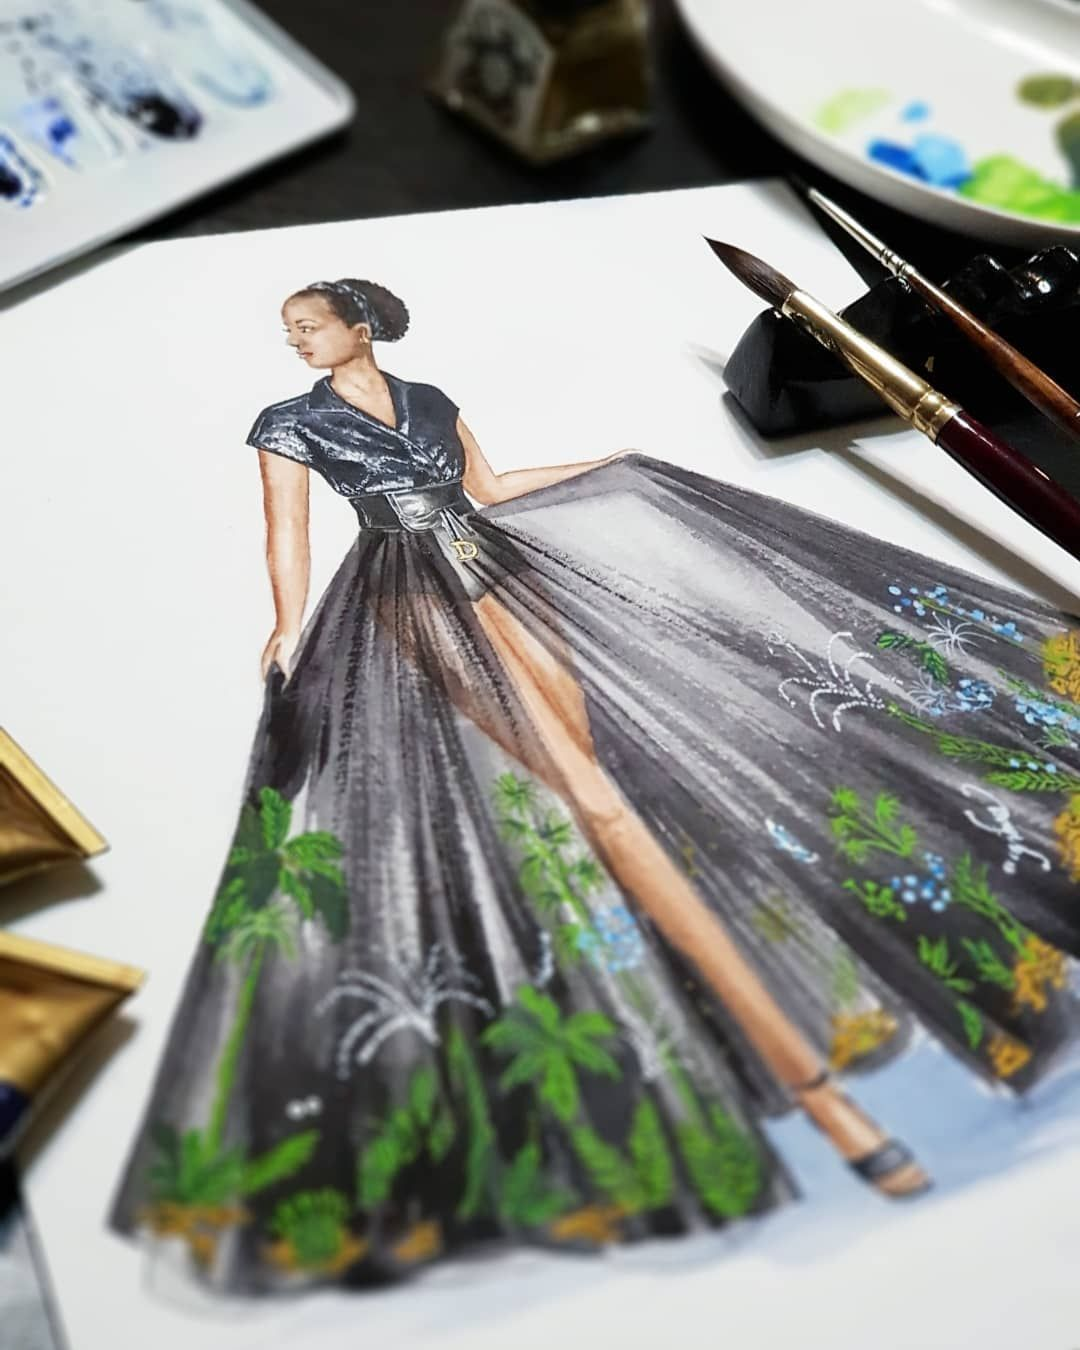 113 - Courses Diploma HSC SSC Results Interior Design Fashion Tailoring  INIFD IIIFT NIFT LSR CKT IFA  Vastu Navi Mumbai Thane Panvel.jpg